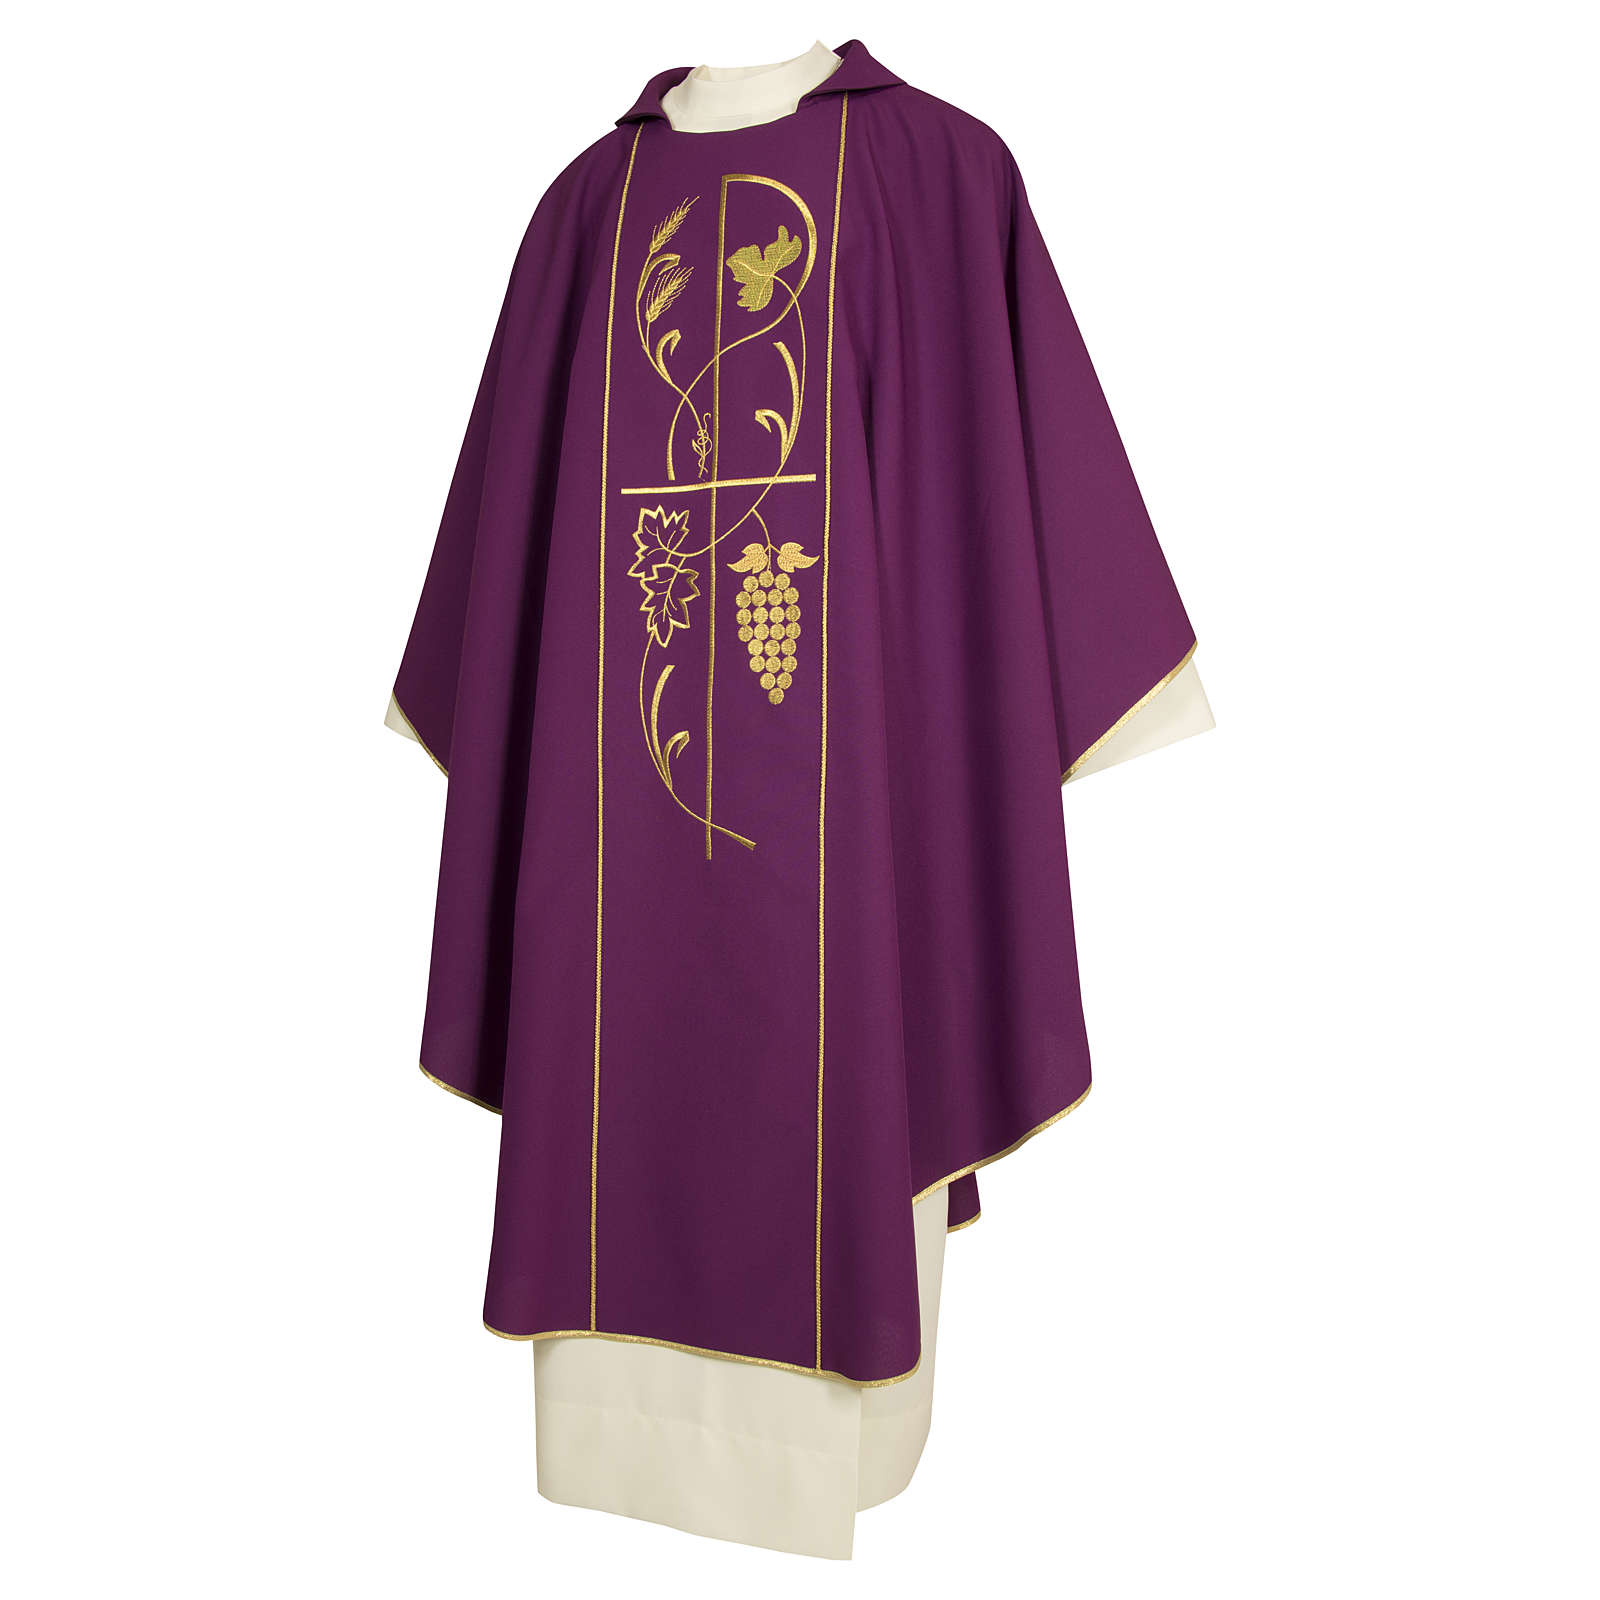 Casula sacerdotale 100% poliestere spighe uva color morello 4